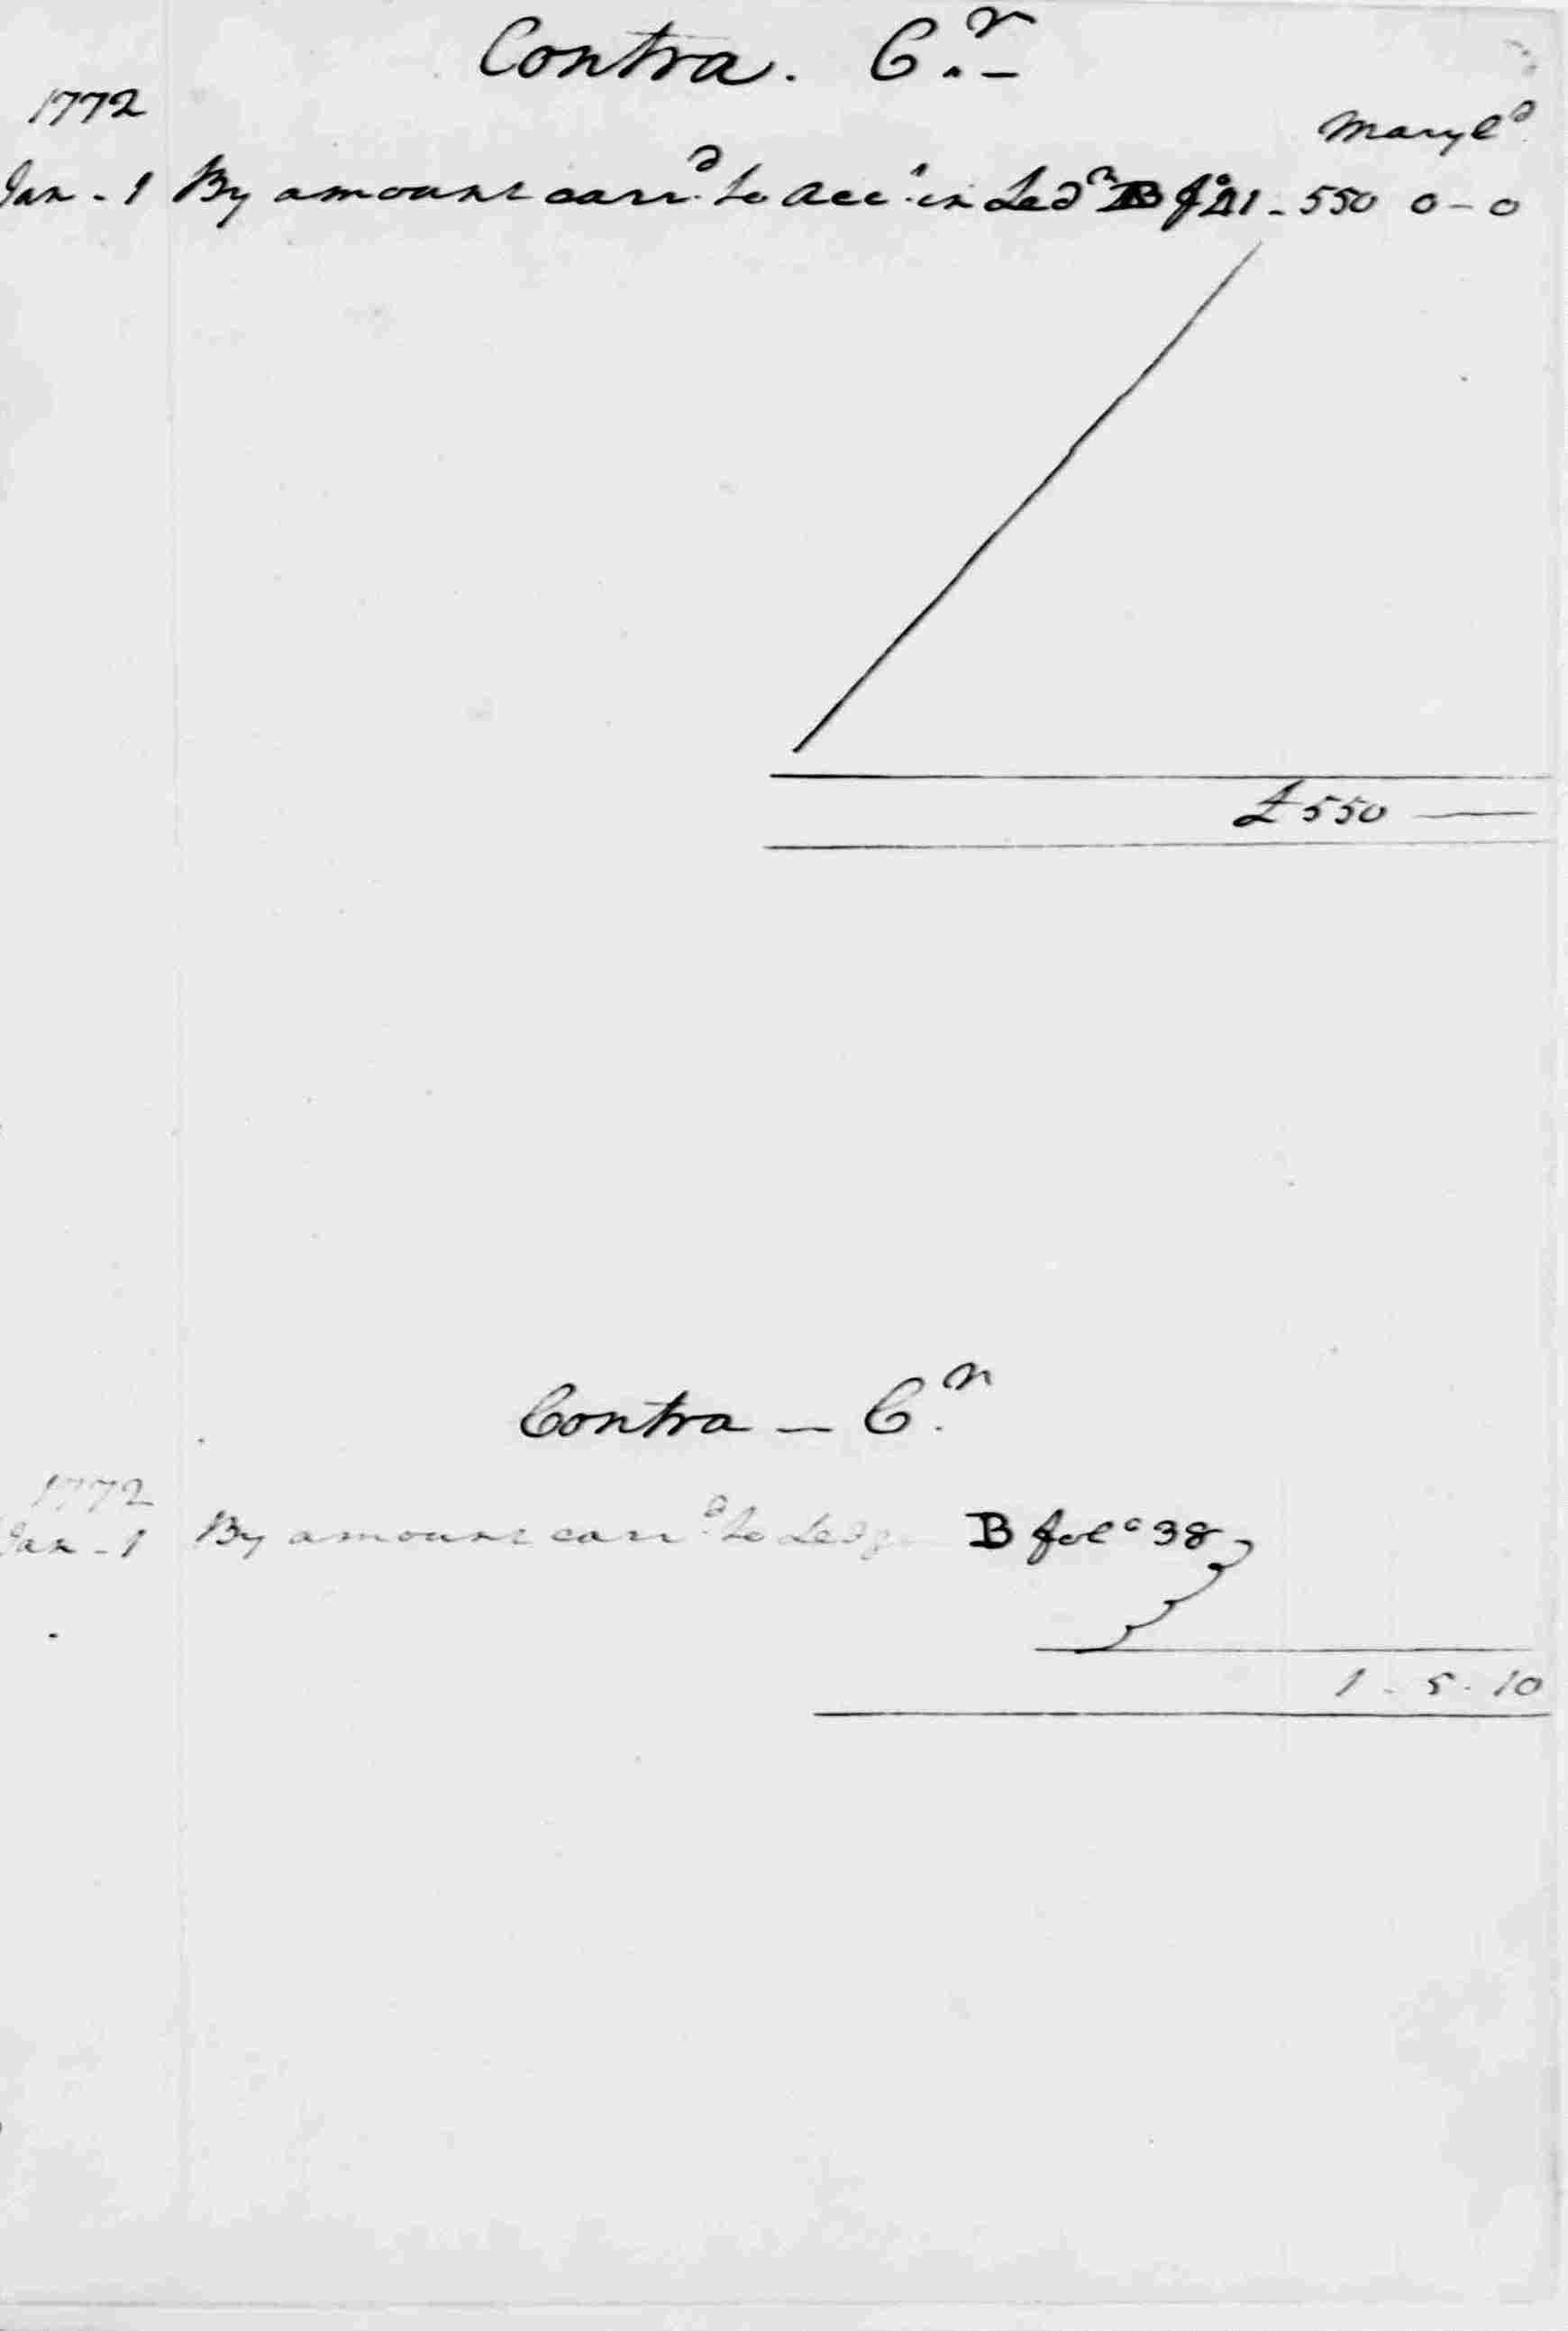 Ledger A, folio 352, right side